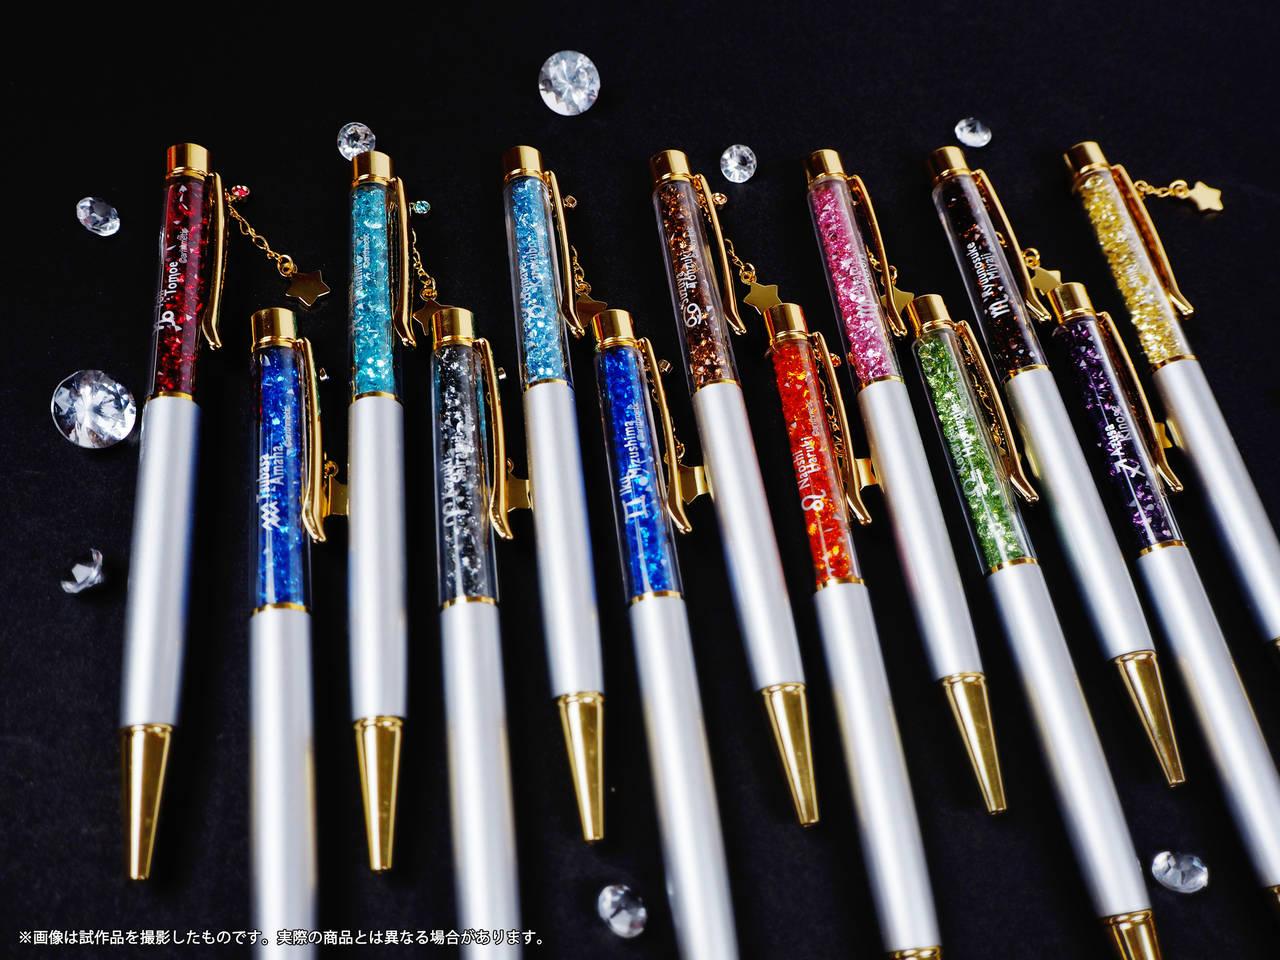 『Starry☆Sky』10周年記念!スワロフスキーを使用したボールペンが登場2